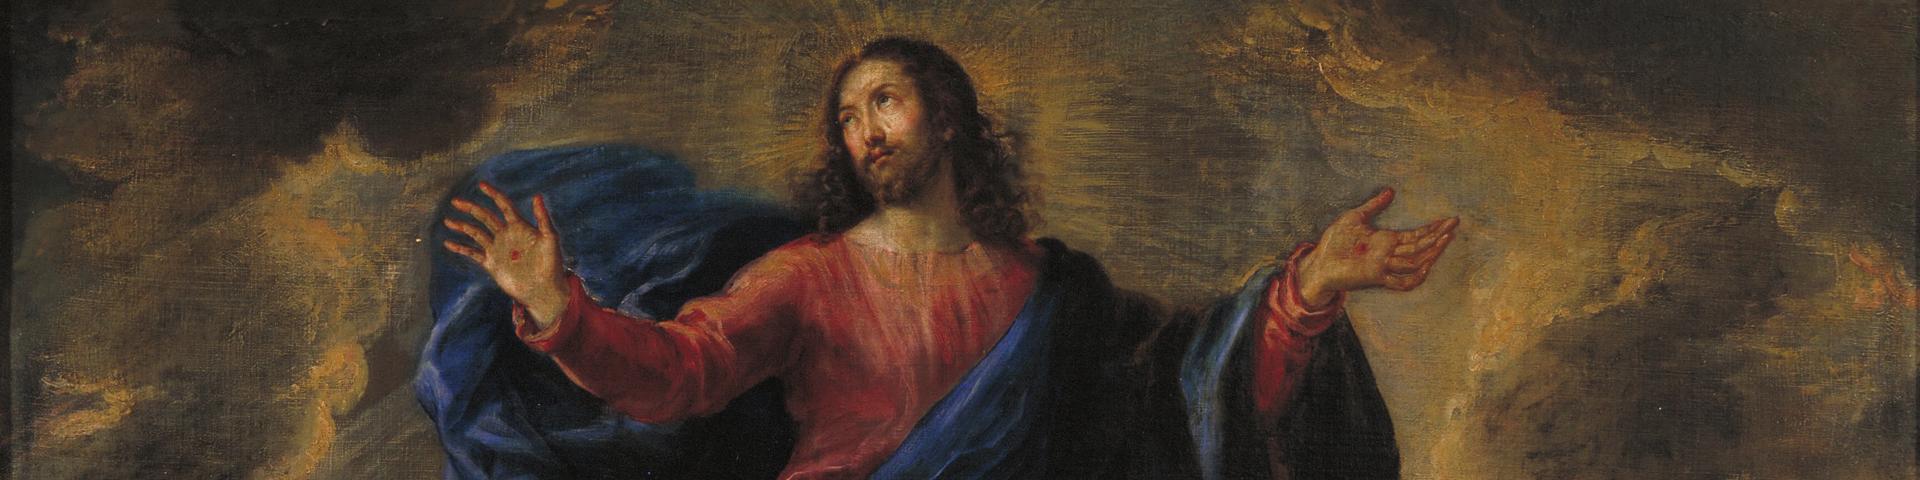 Evangelization, Catholic Identity, and Ascension Thursday